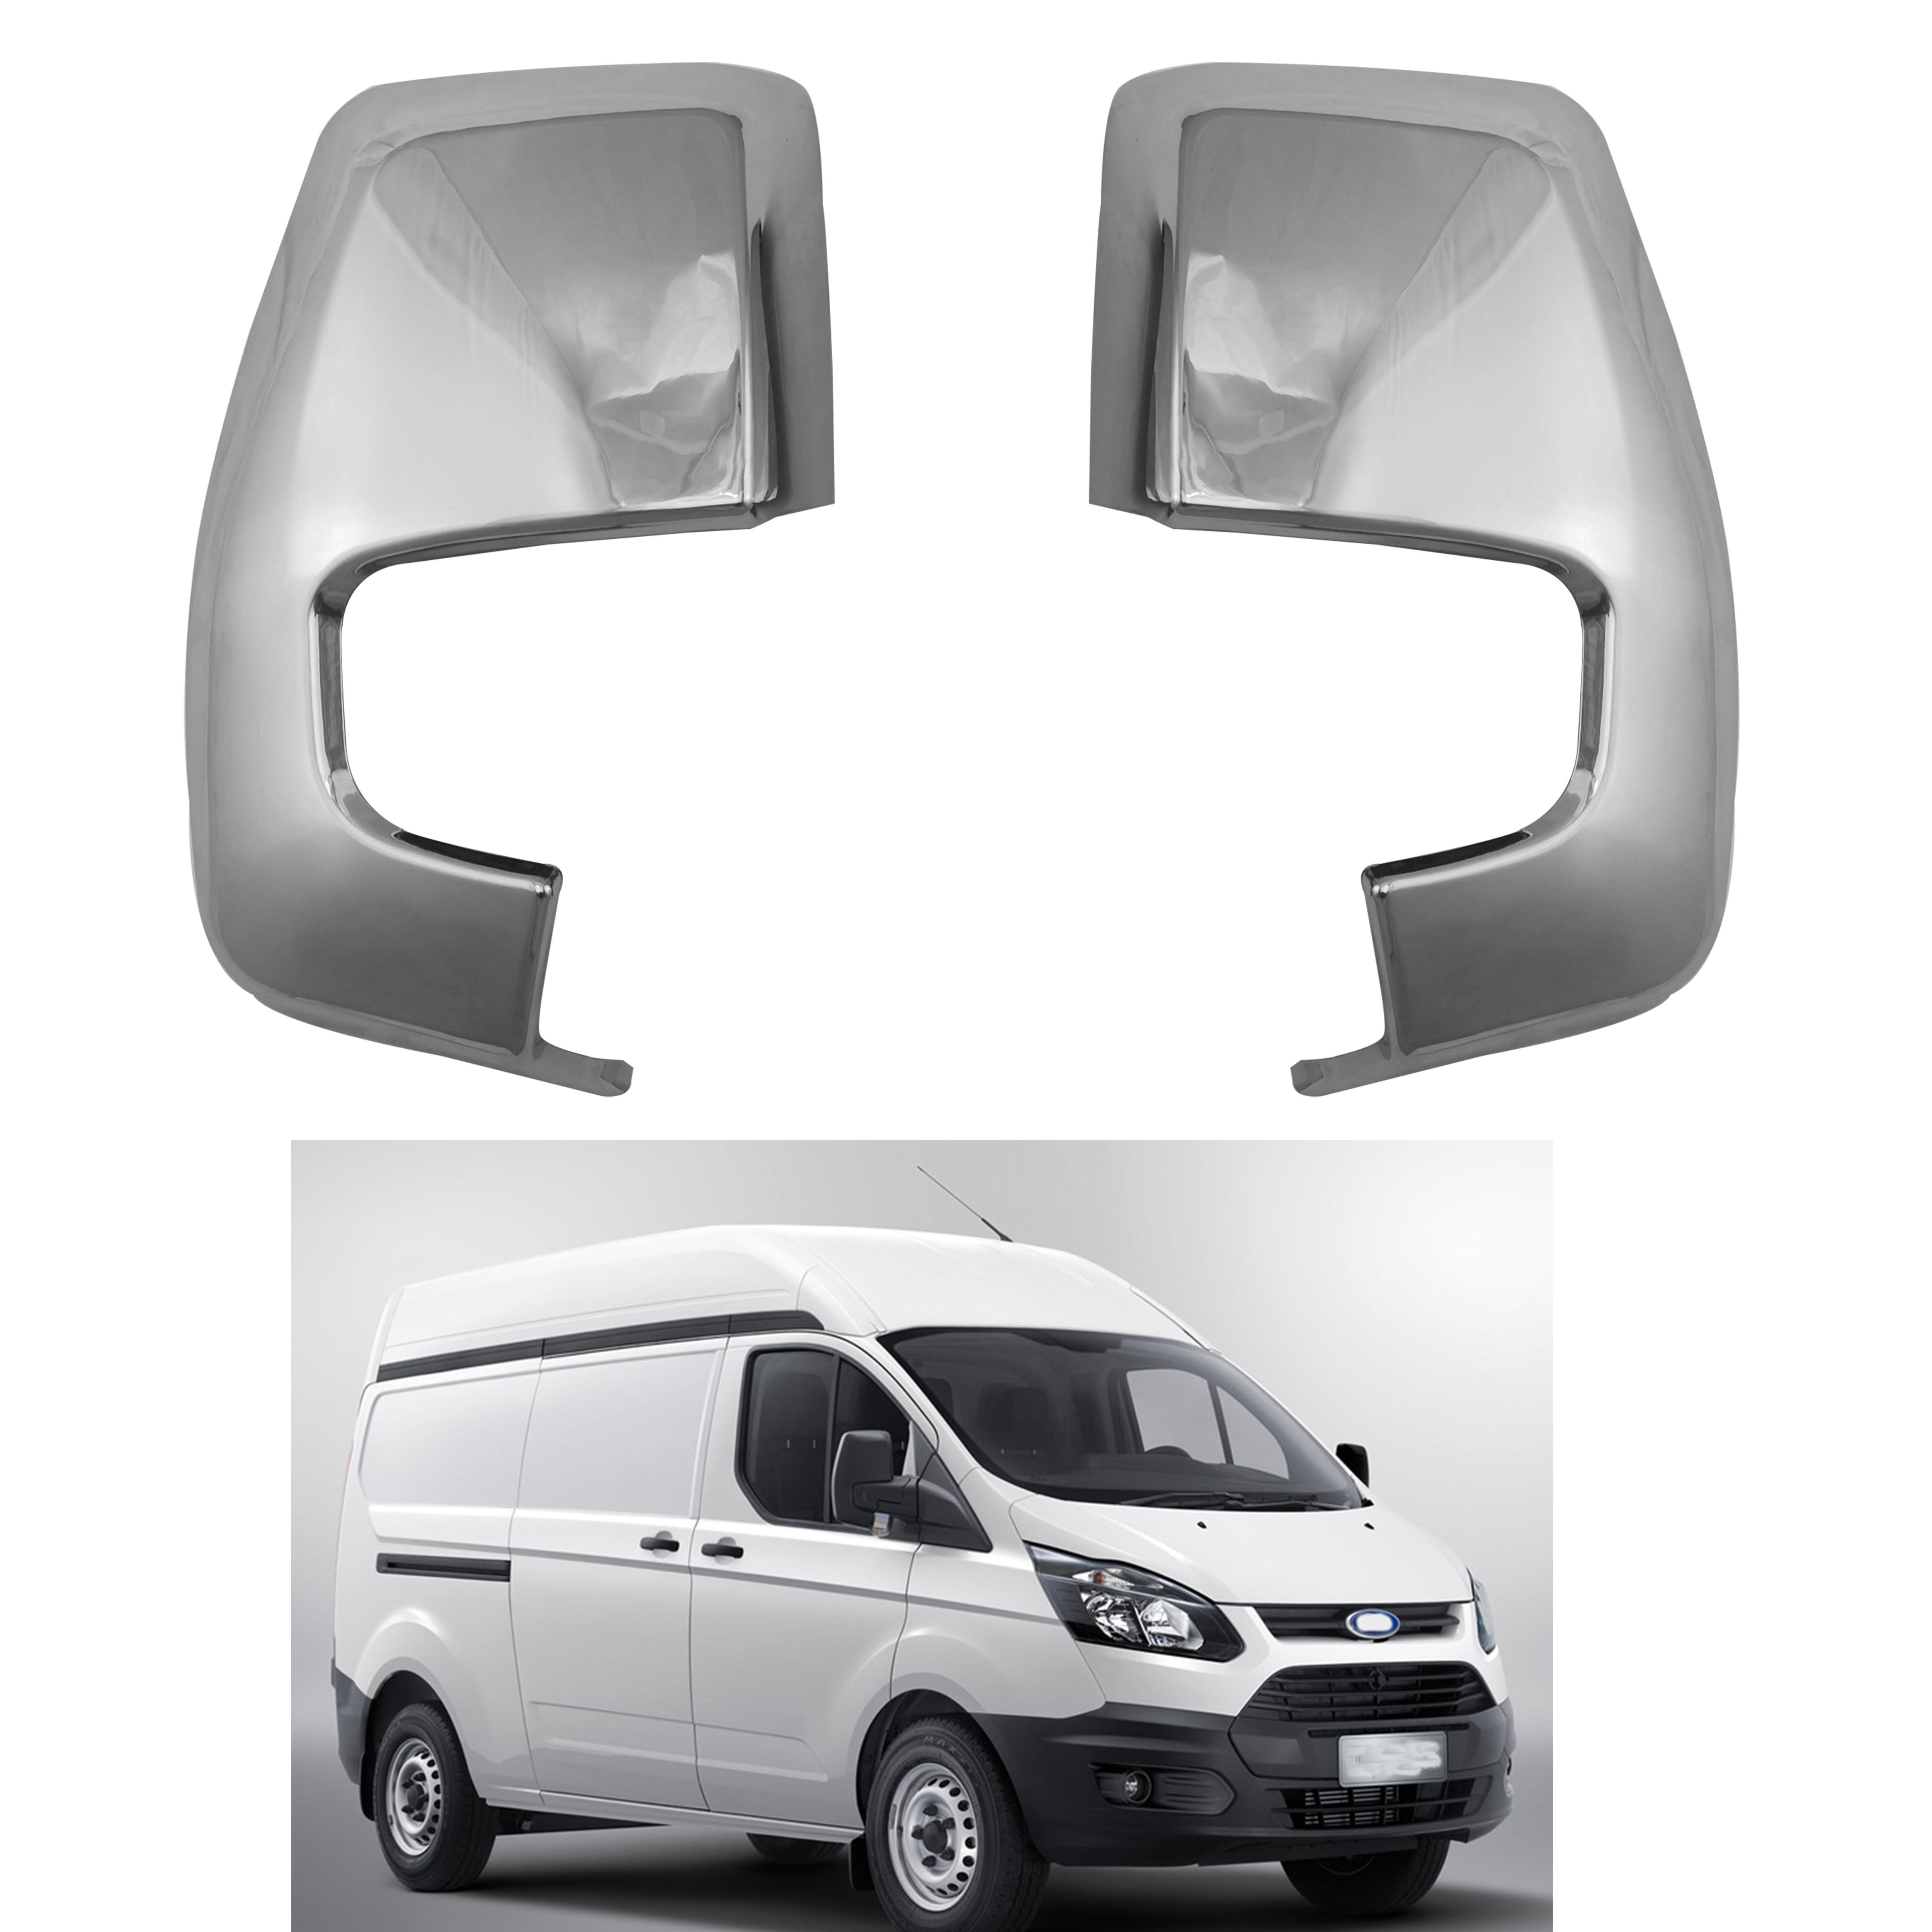 2 piezas ABS cromado coche puerta lateral vista trasera espejo cubierta para Ford tránsito Tourneo 2015-2018 exterior del coche trim accesorio